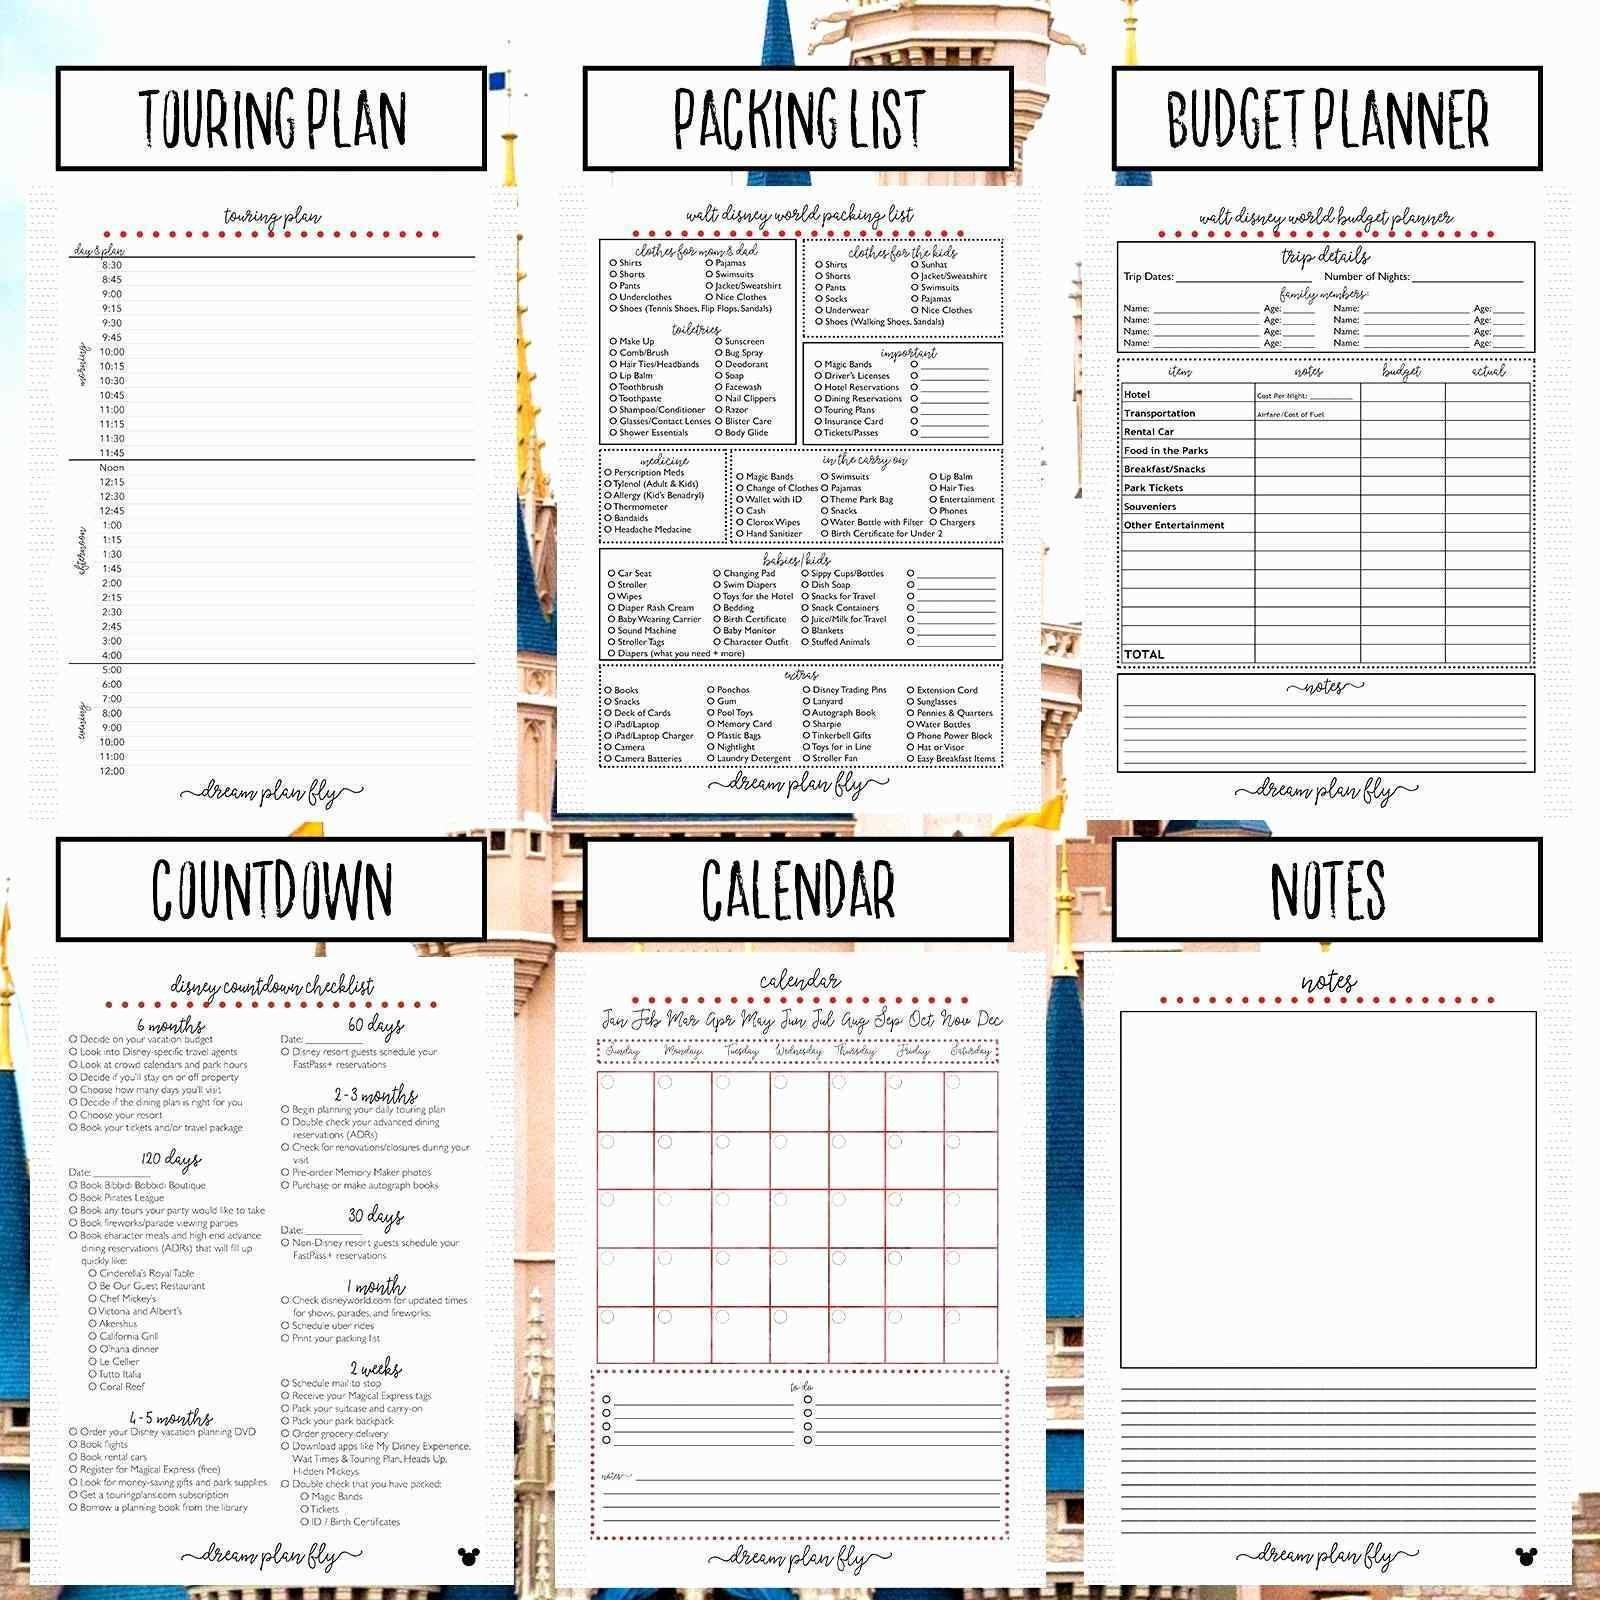 2019 Australian Calendar In Excel Más Actual Calendar 2018 and 2019 In Excel Full Year Calendar Template Of 2019 Australian Calendar In Excel Más Recientemente Liberado Excel Calendar Template 2018 Glendale Munity Document Template